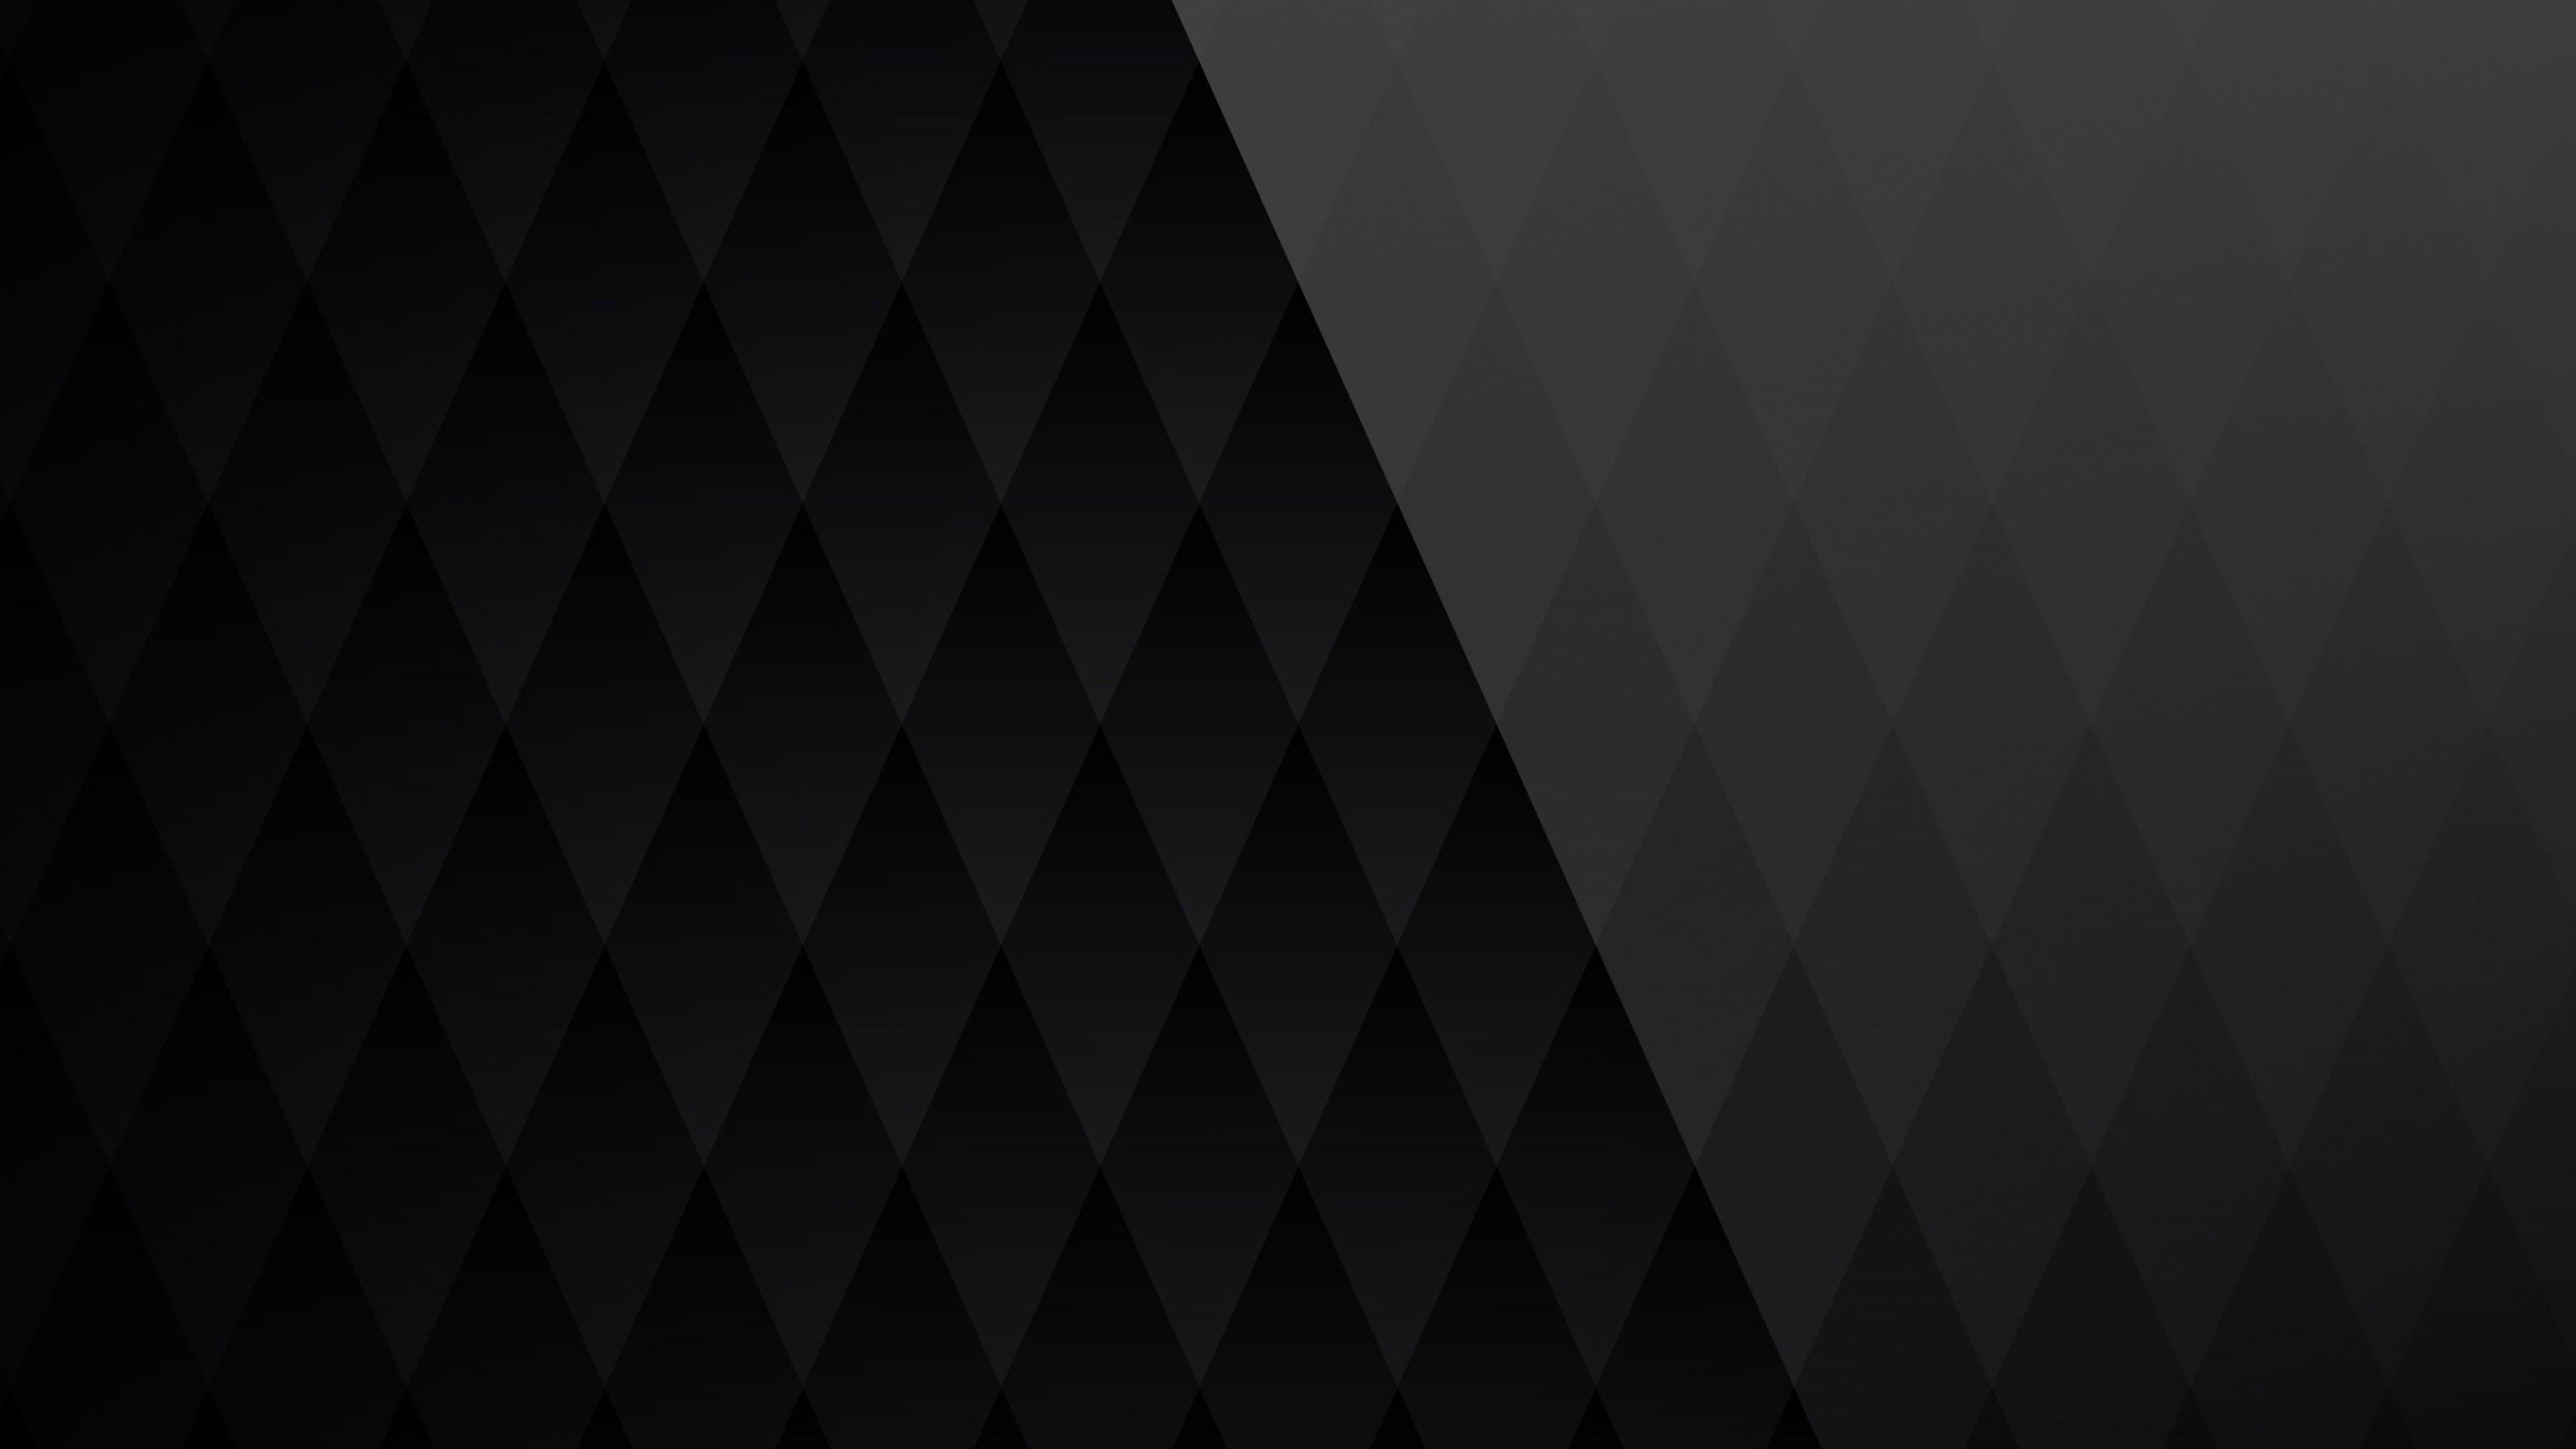 Vc39 Black Diamond Pattern Papers Co